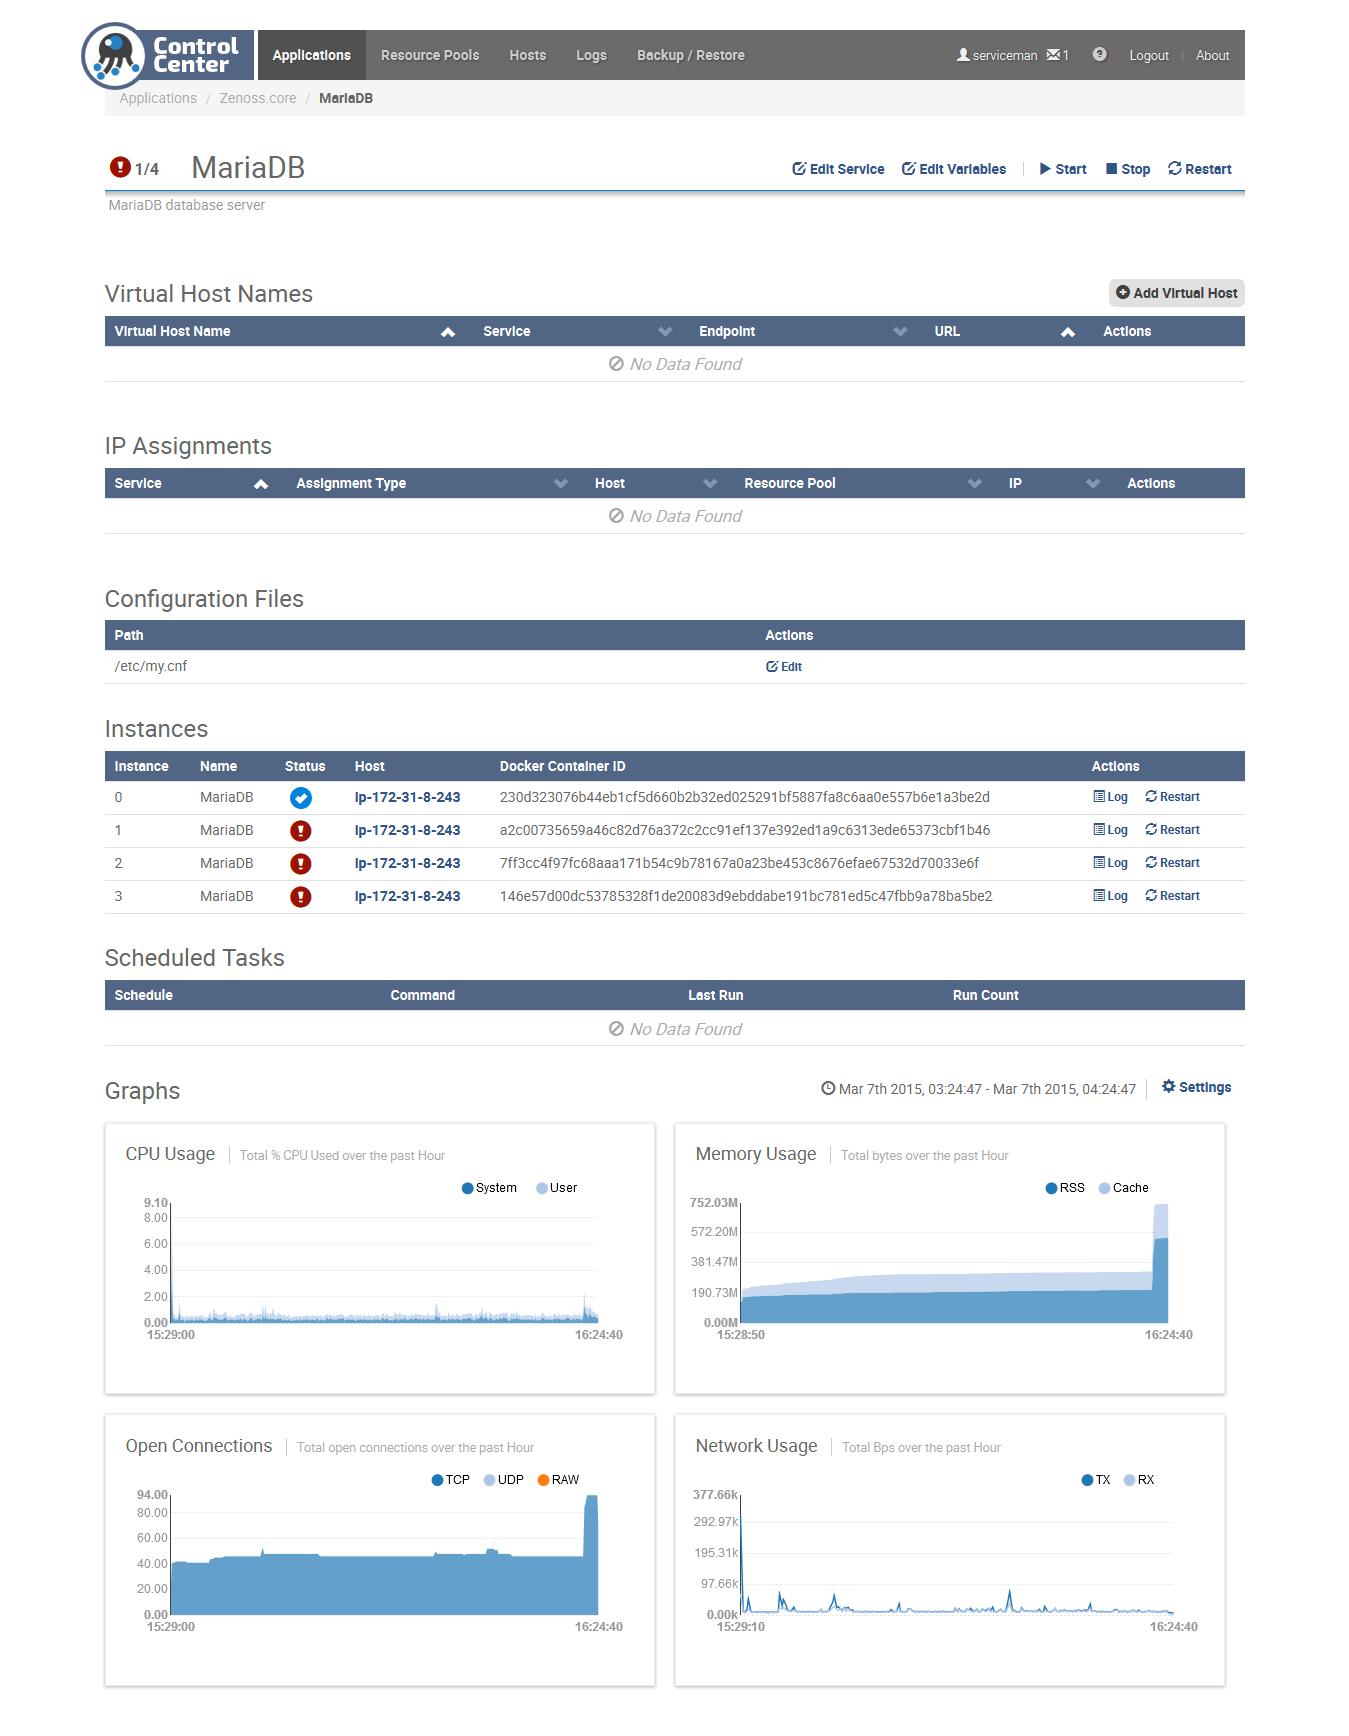 Zenoss 5 Core - 4 instances of MariaDB in Control Center